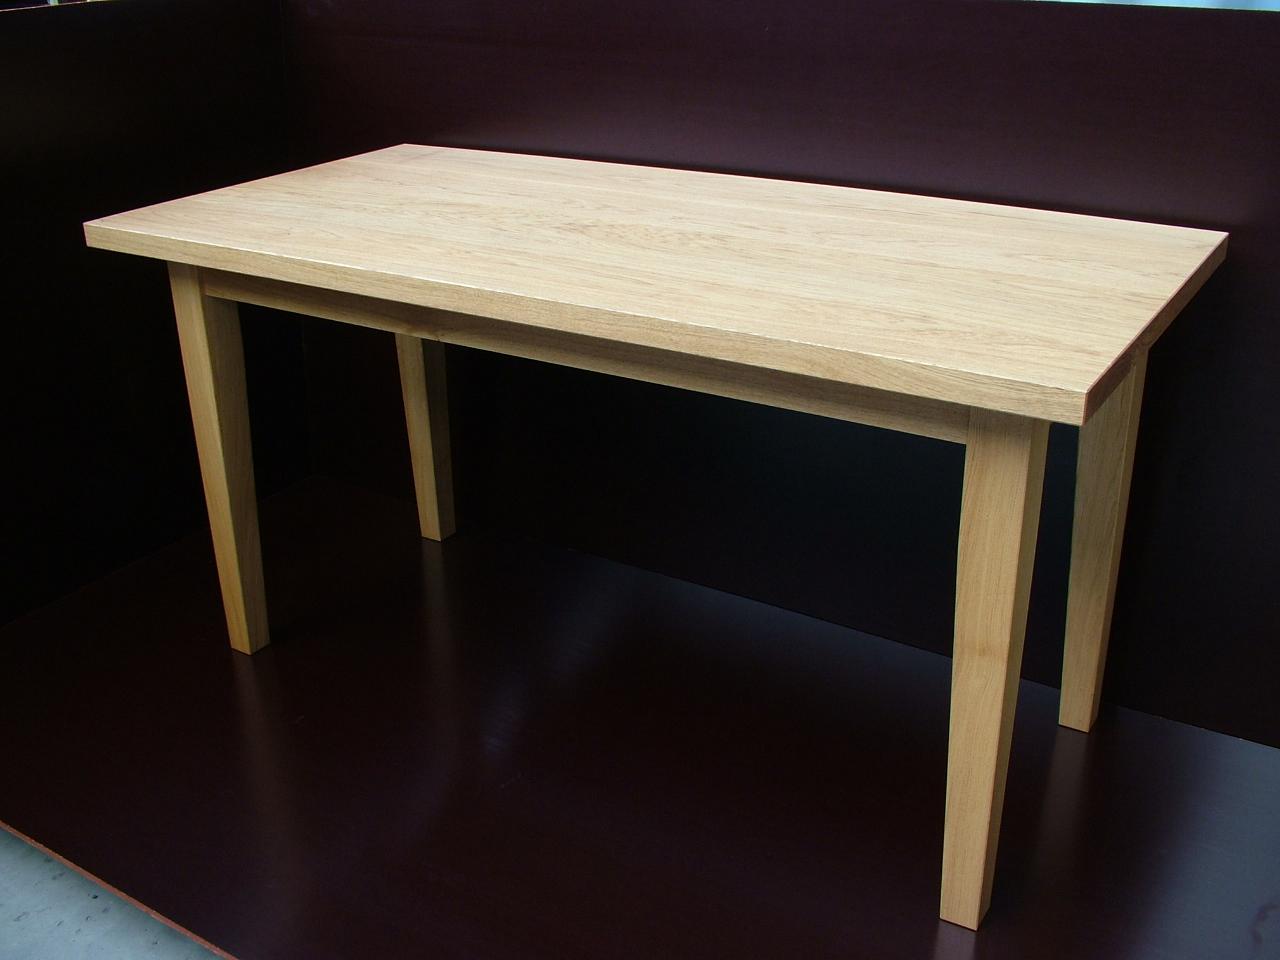 Tavoli da cucina design 1 0 5 0 pezzi all 39 anno - Tavoli da cucina design ...